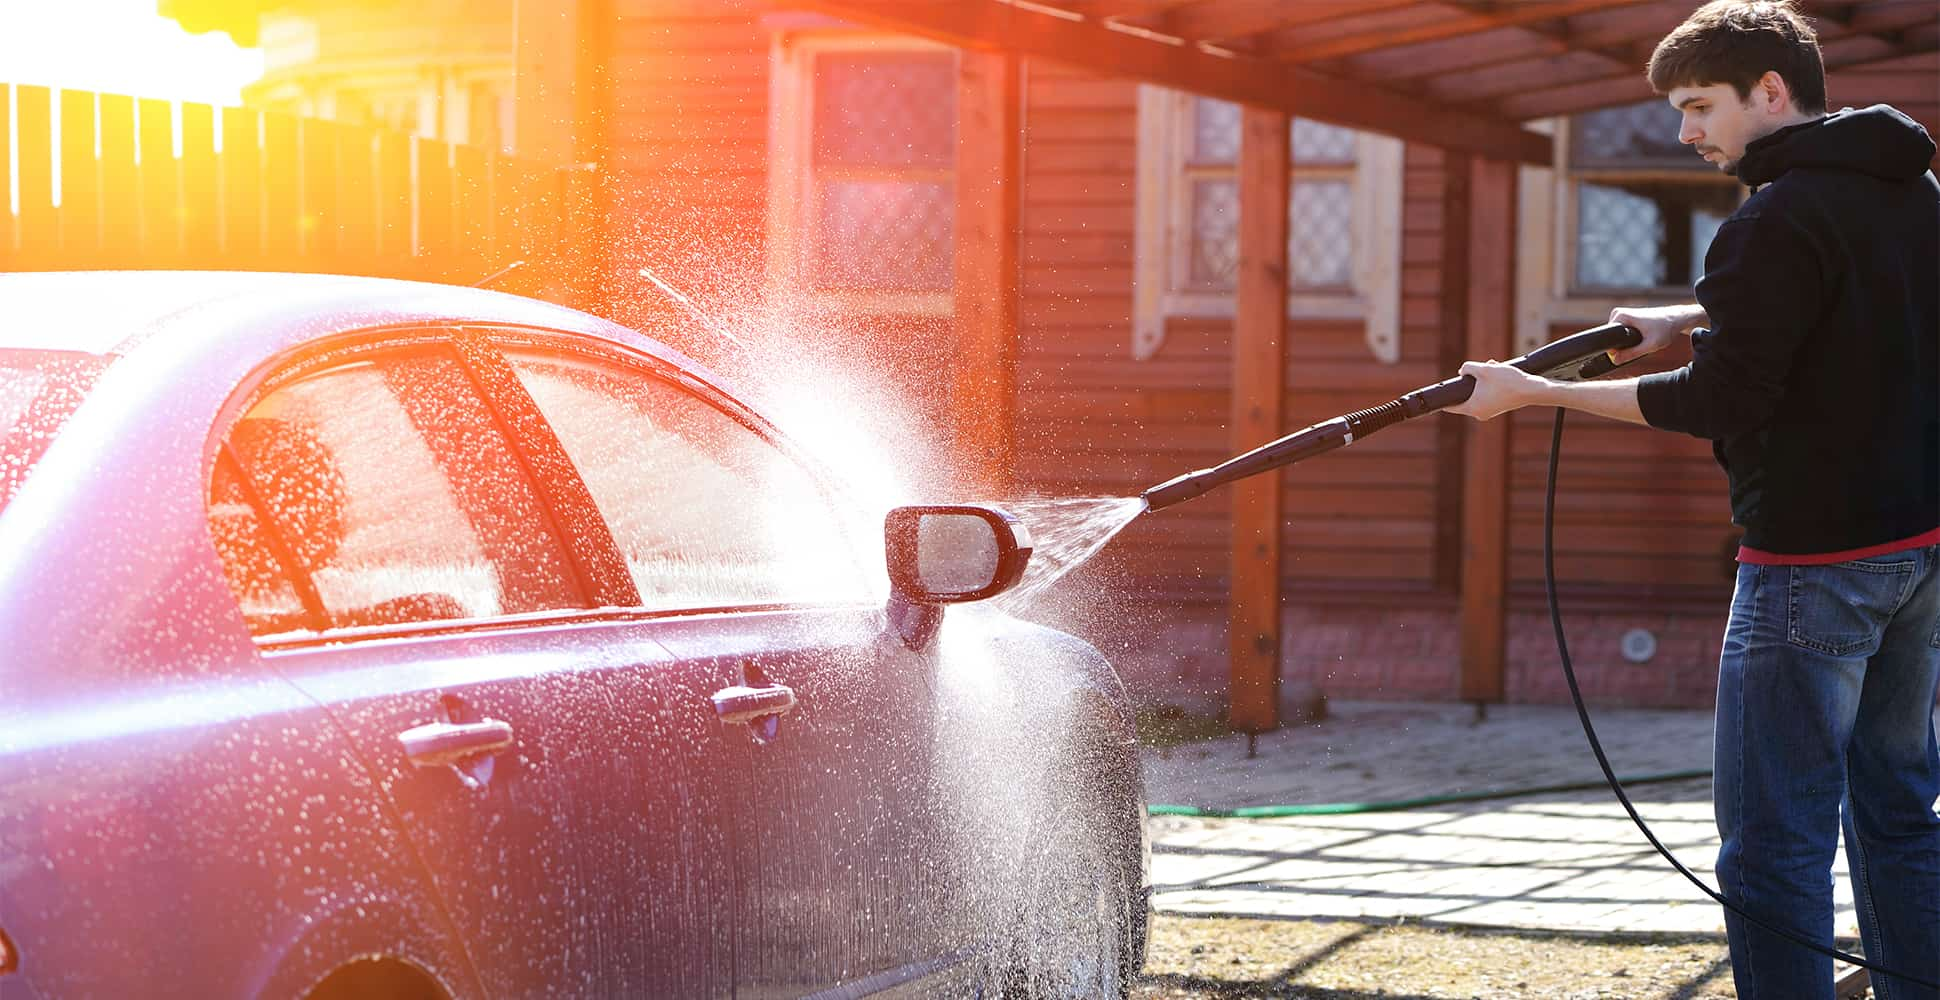 best-pressure-washer-for-car-uk